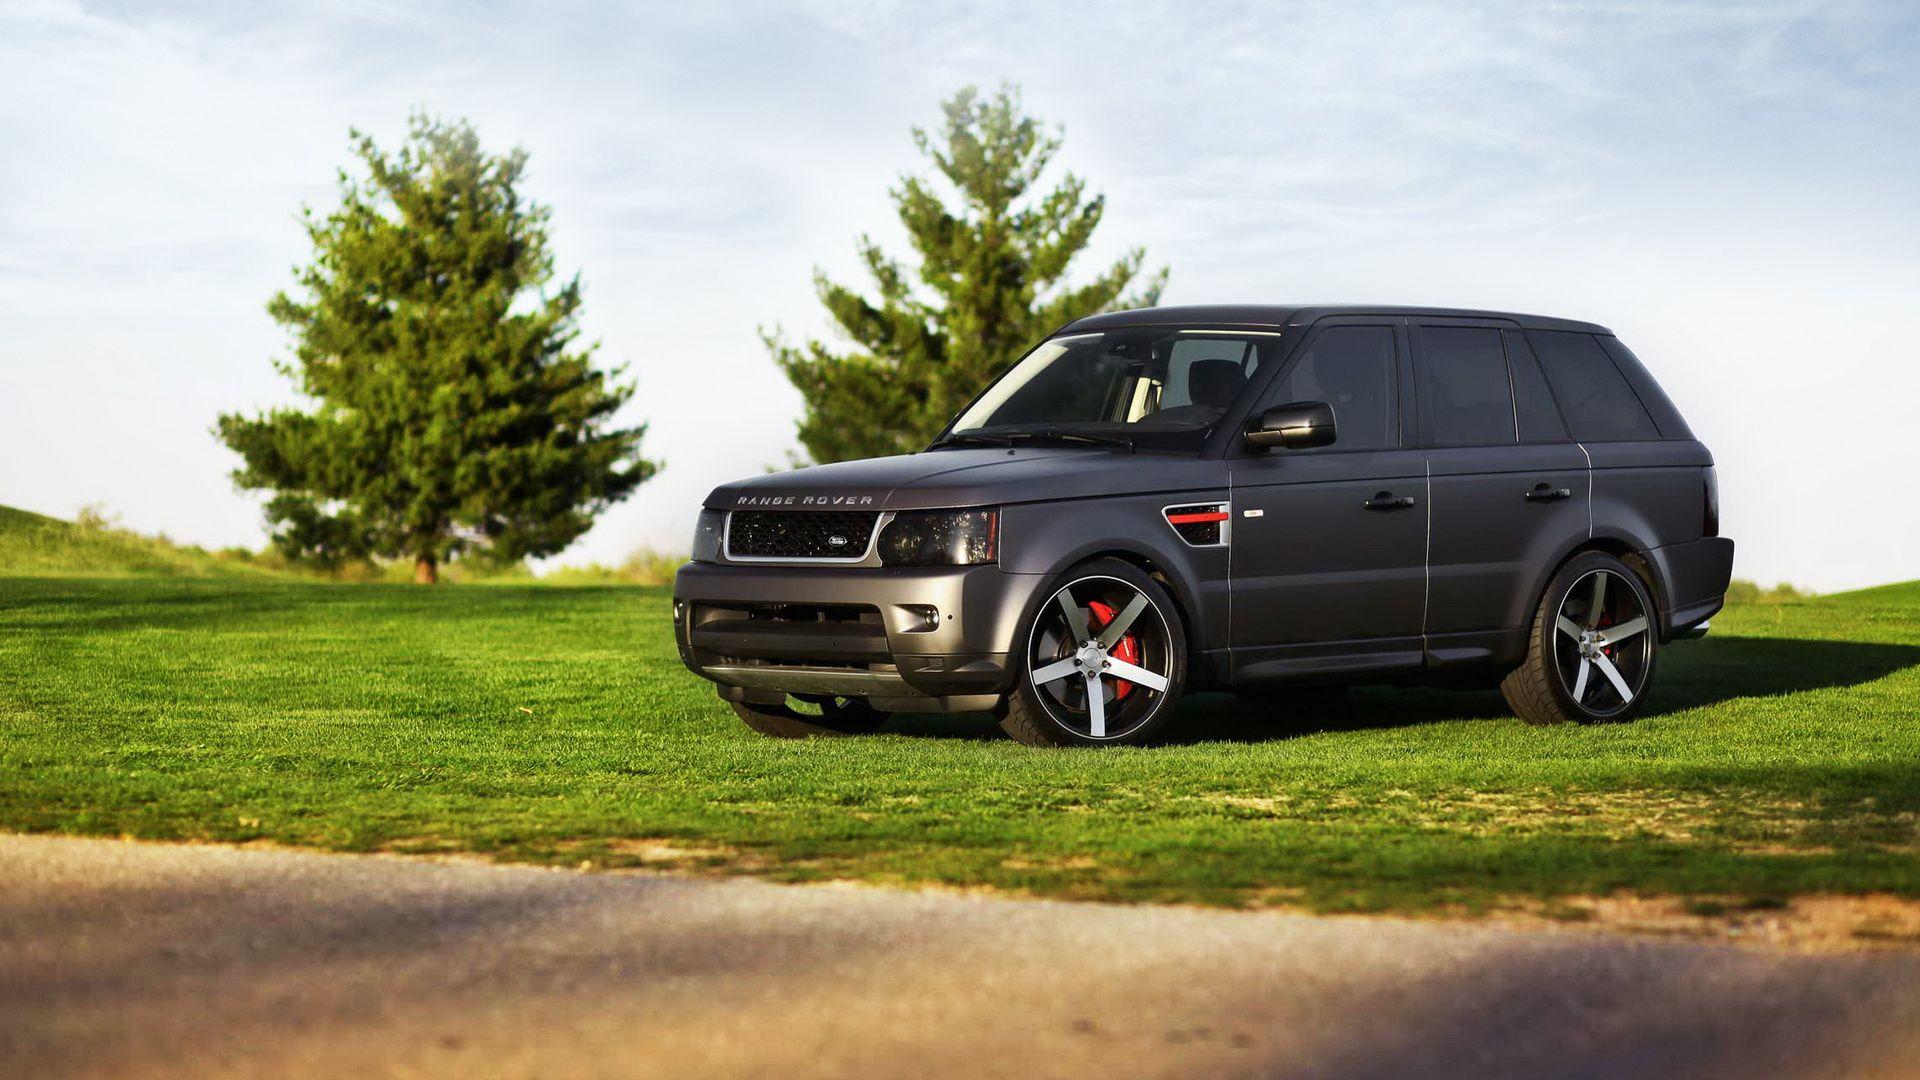 Range Rover desktop wallpaper